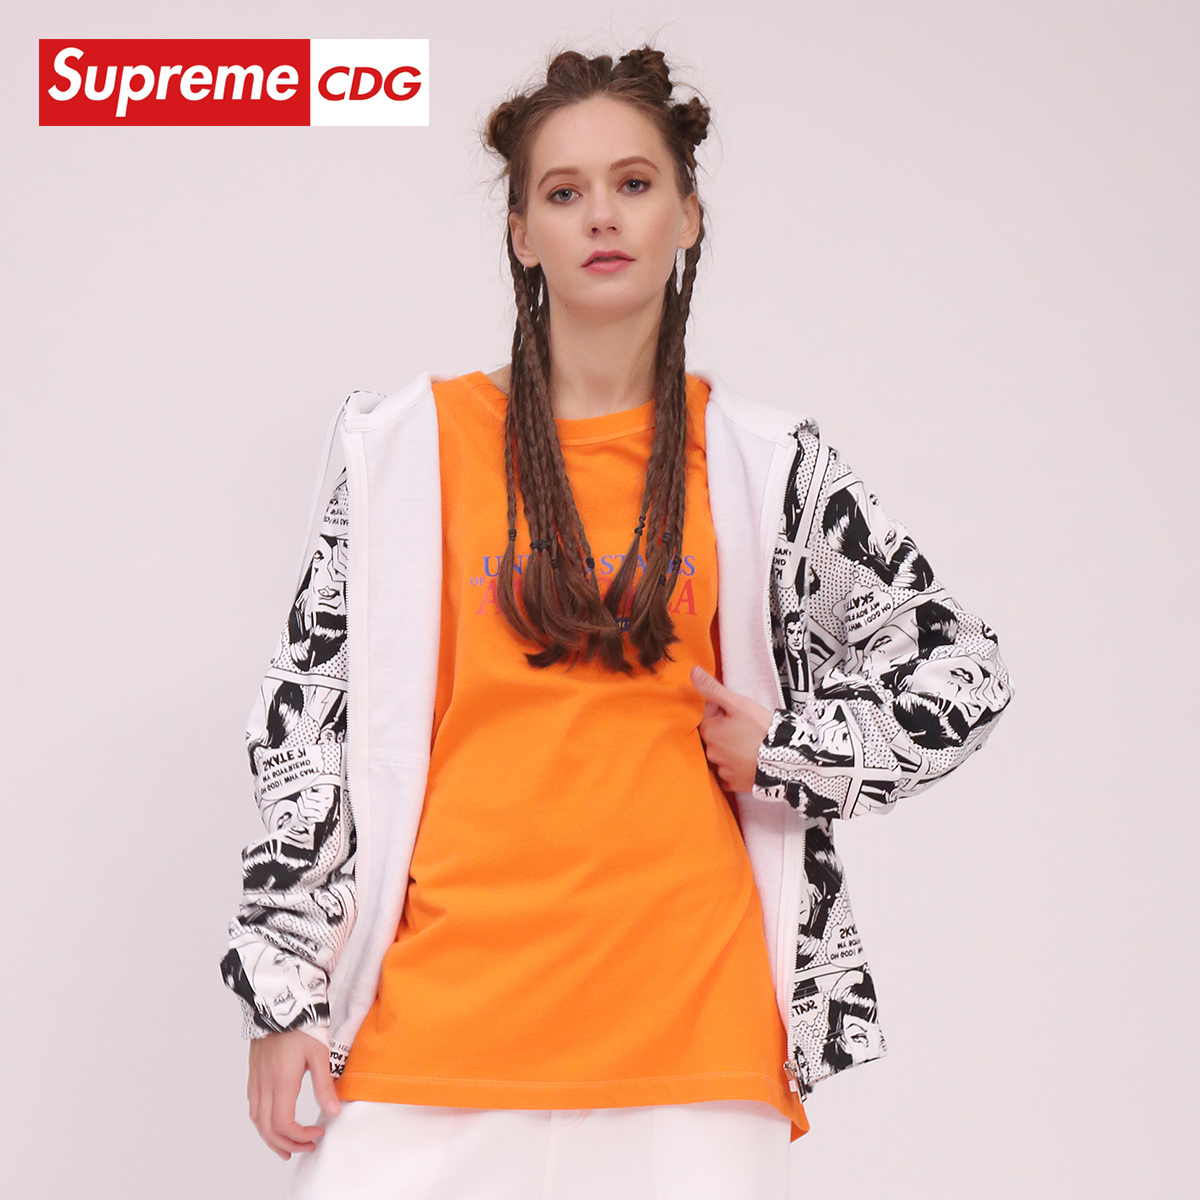 Supreme CDG 2020年春季新款 休閑街頭時尚衛衣男女同款拉鏈外套